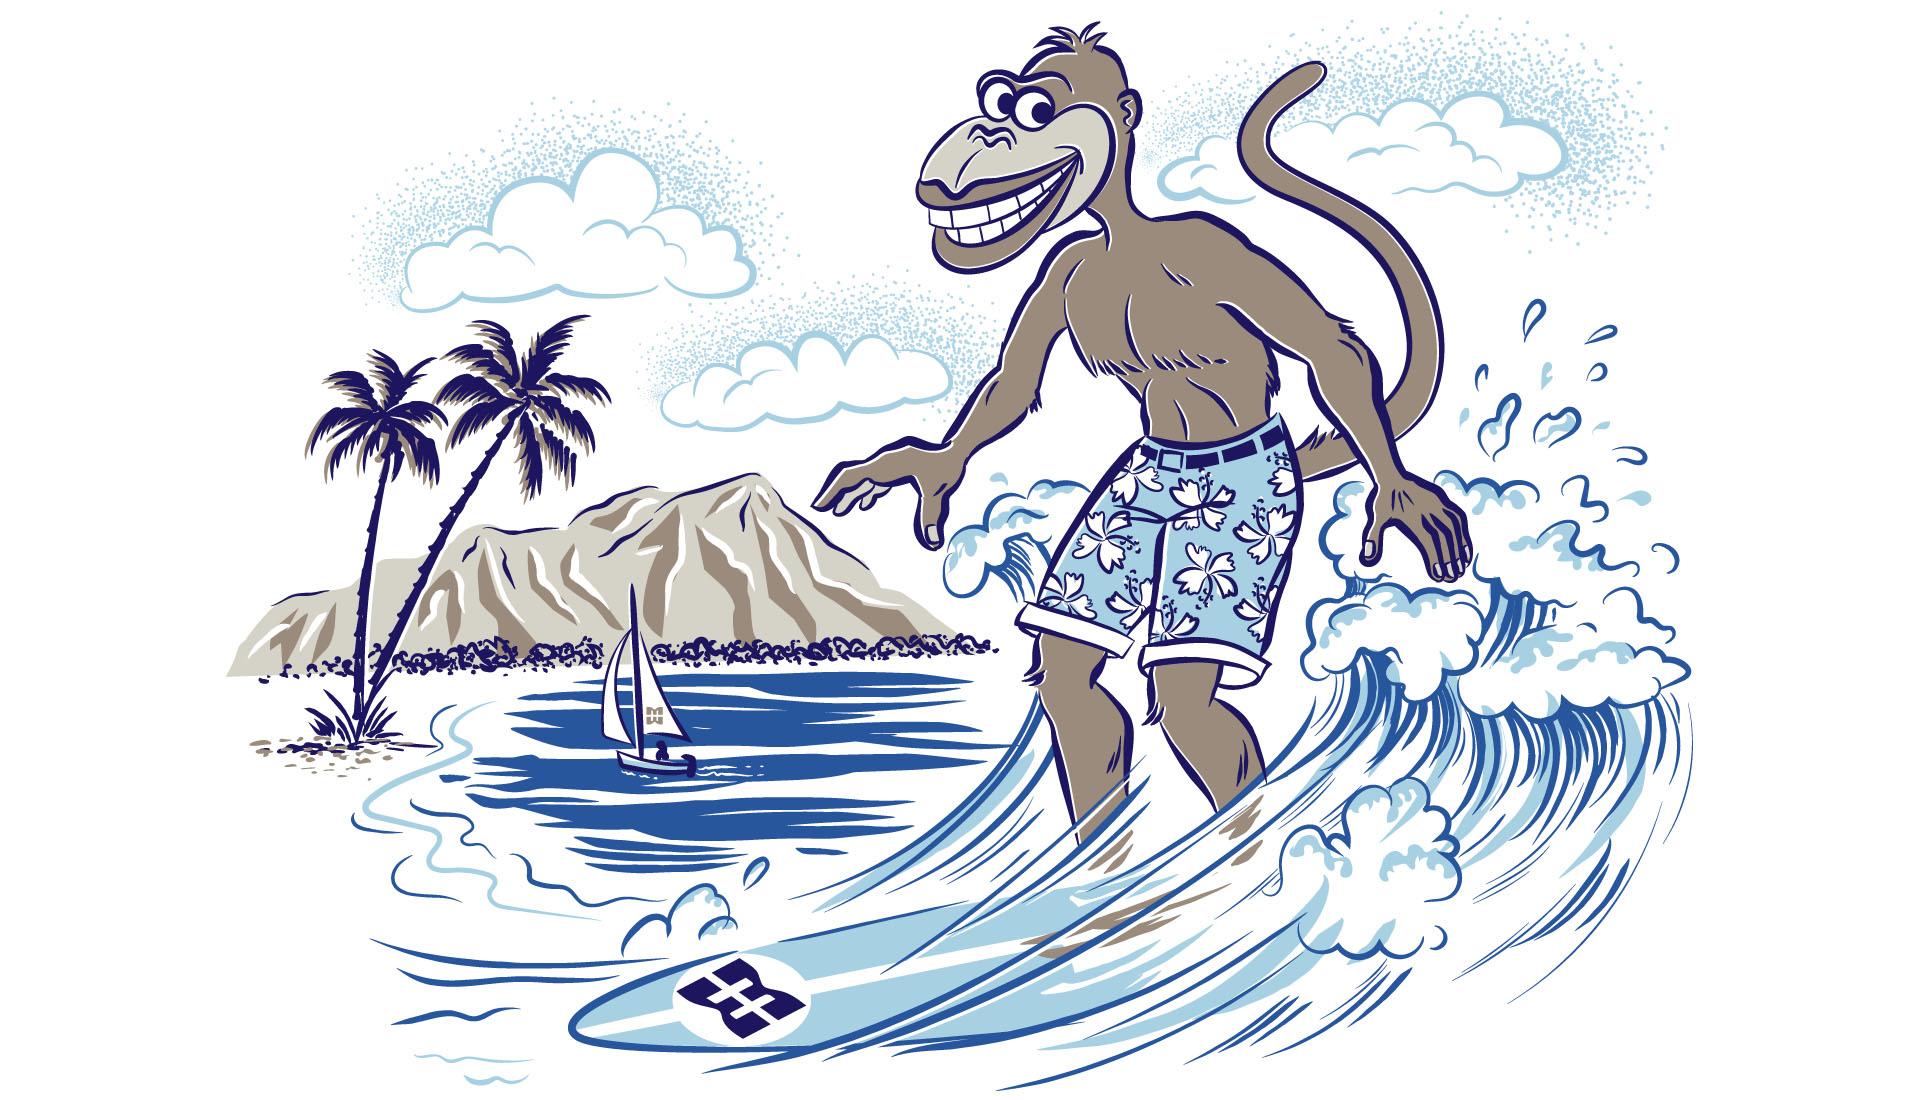 KoKo Surfs Waikiki